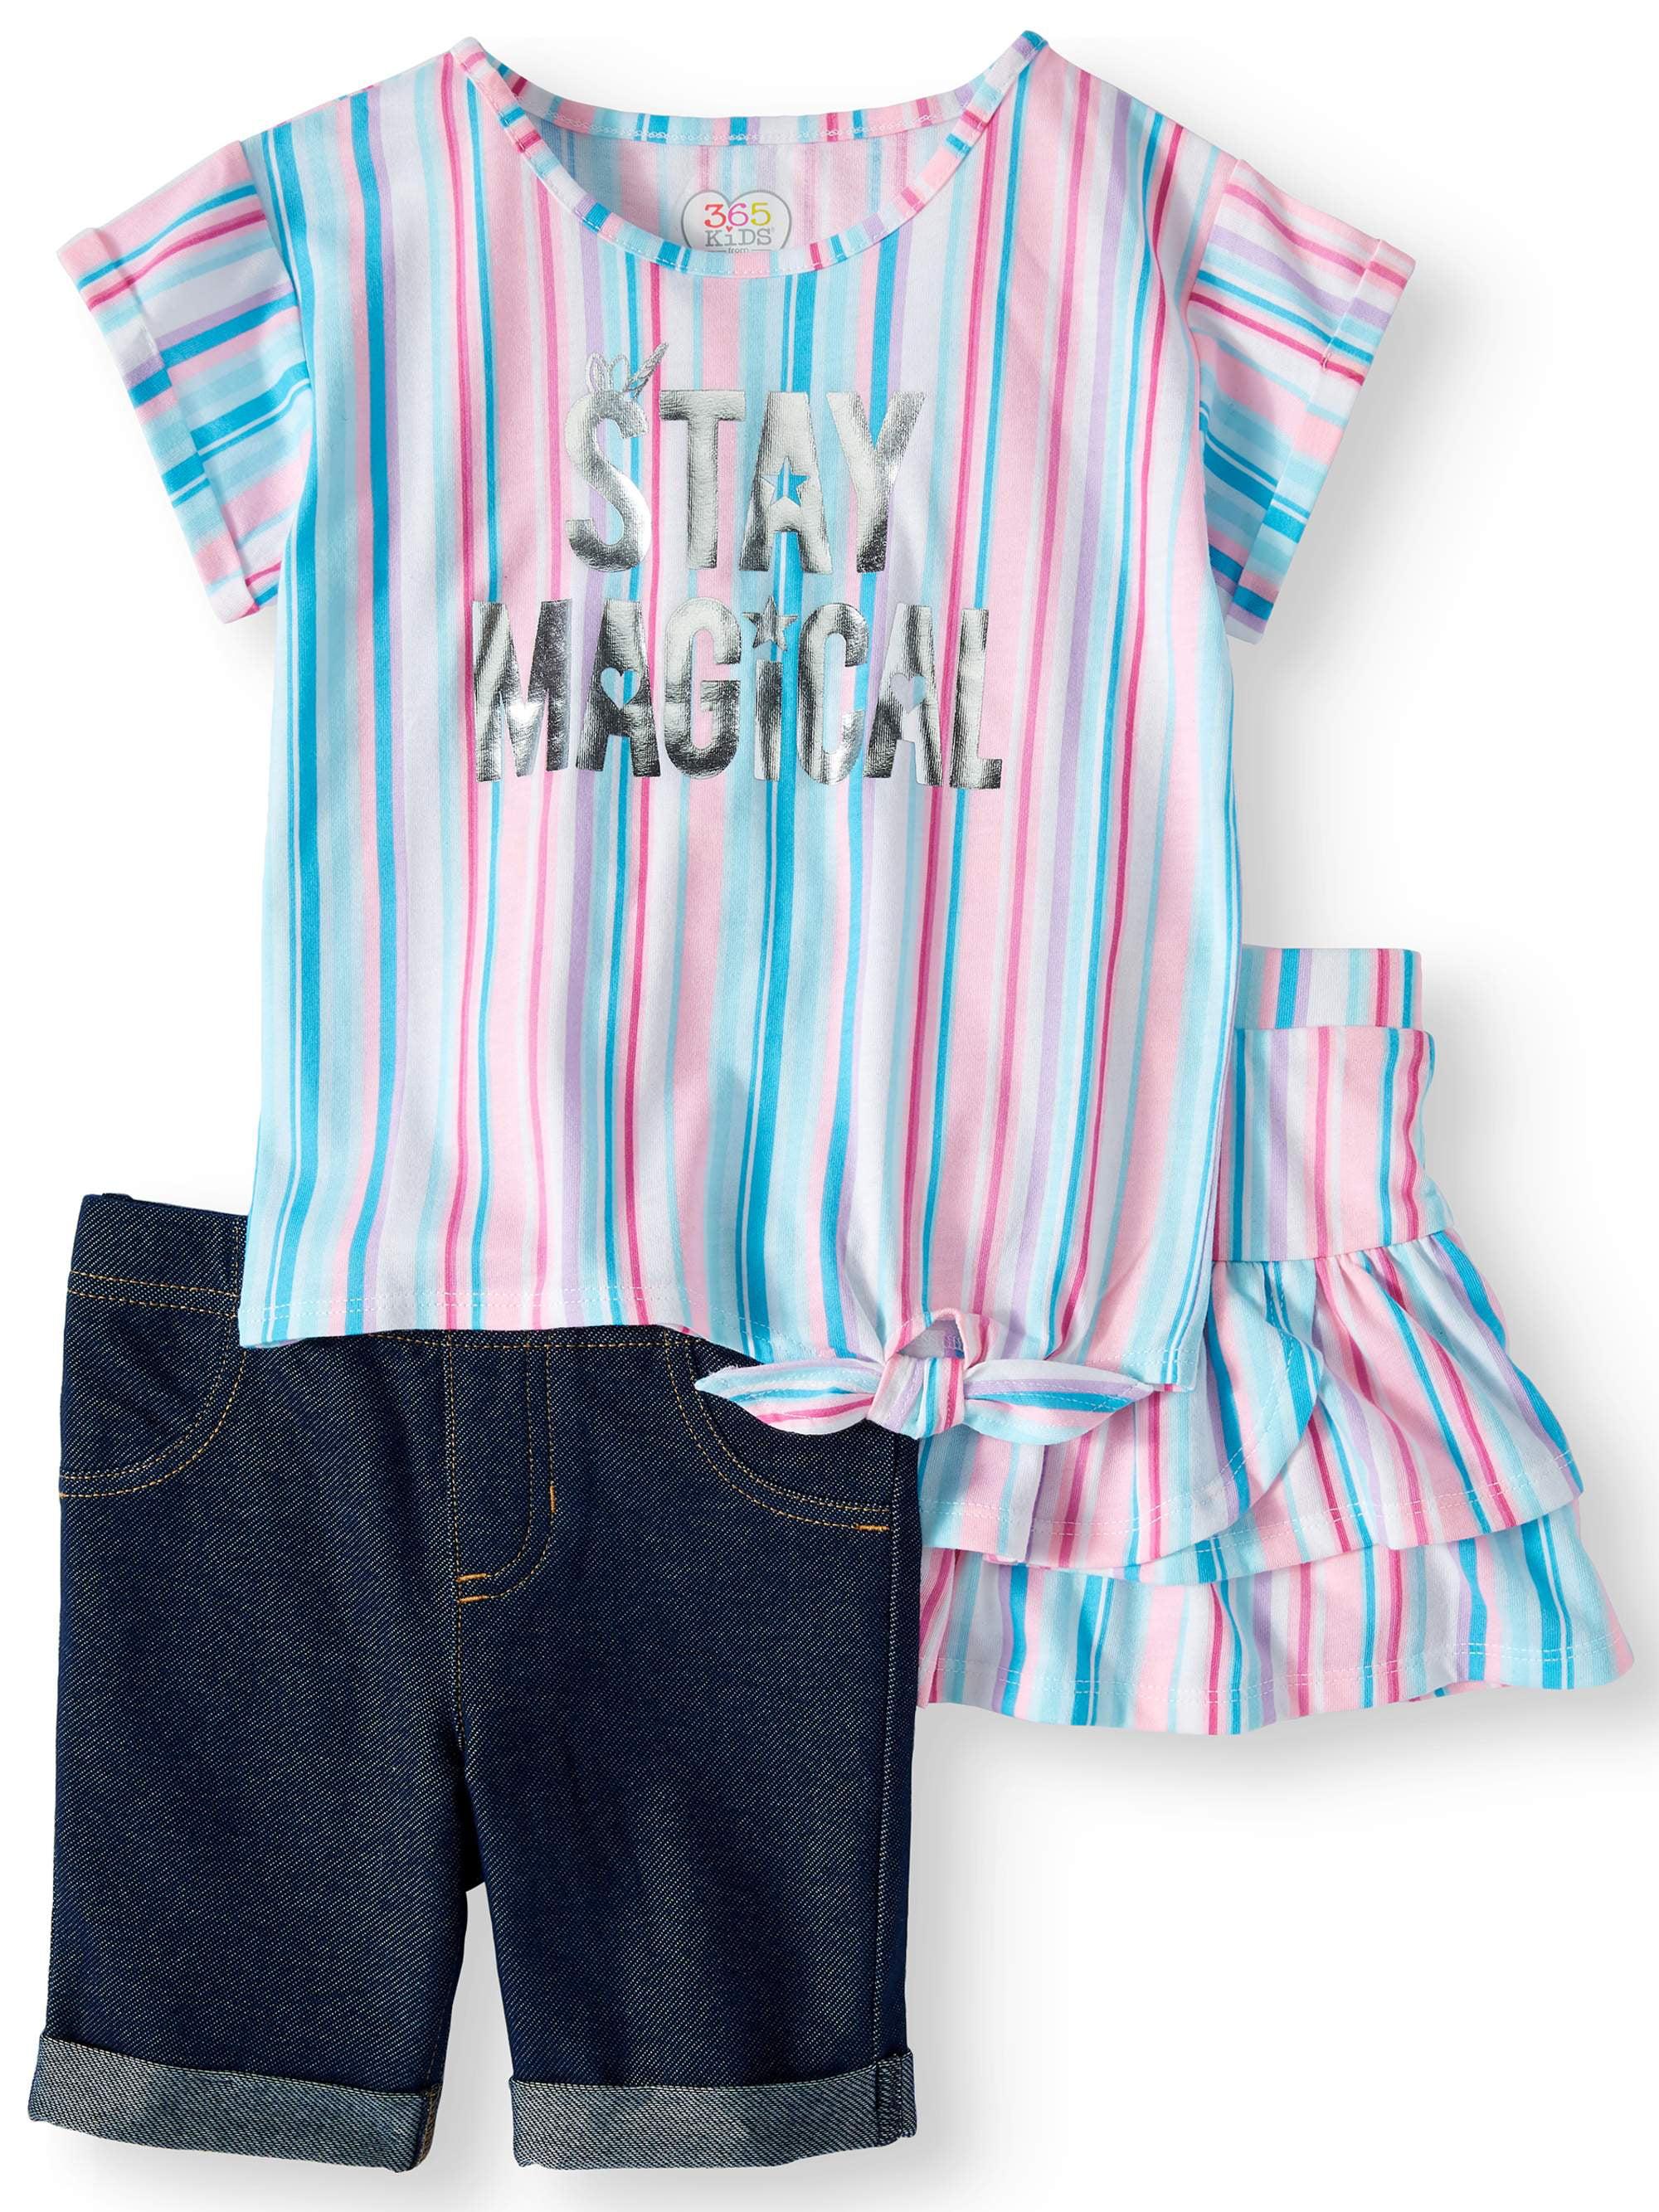 Side-Tie Top, Bermuda Short & Skort, 3-Piece Mix and Match Outfit Set (Little Girls & Big Girls)